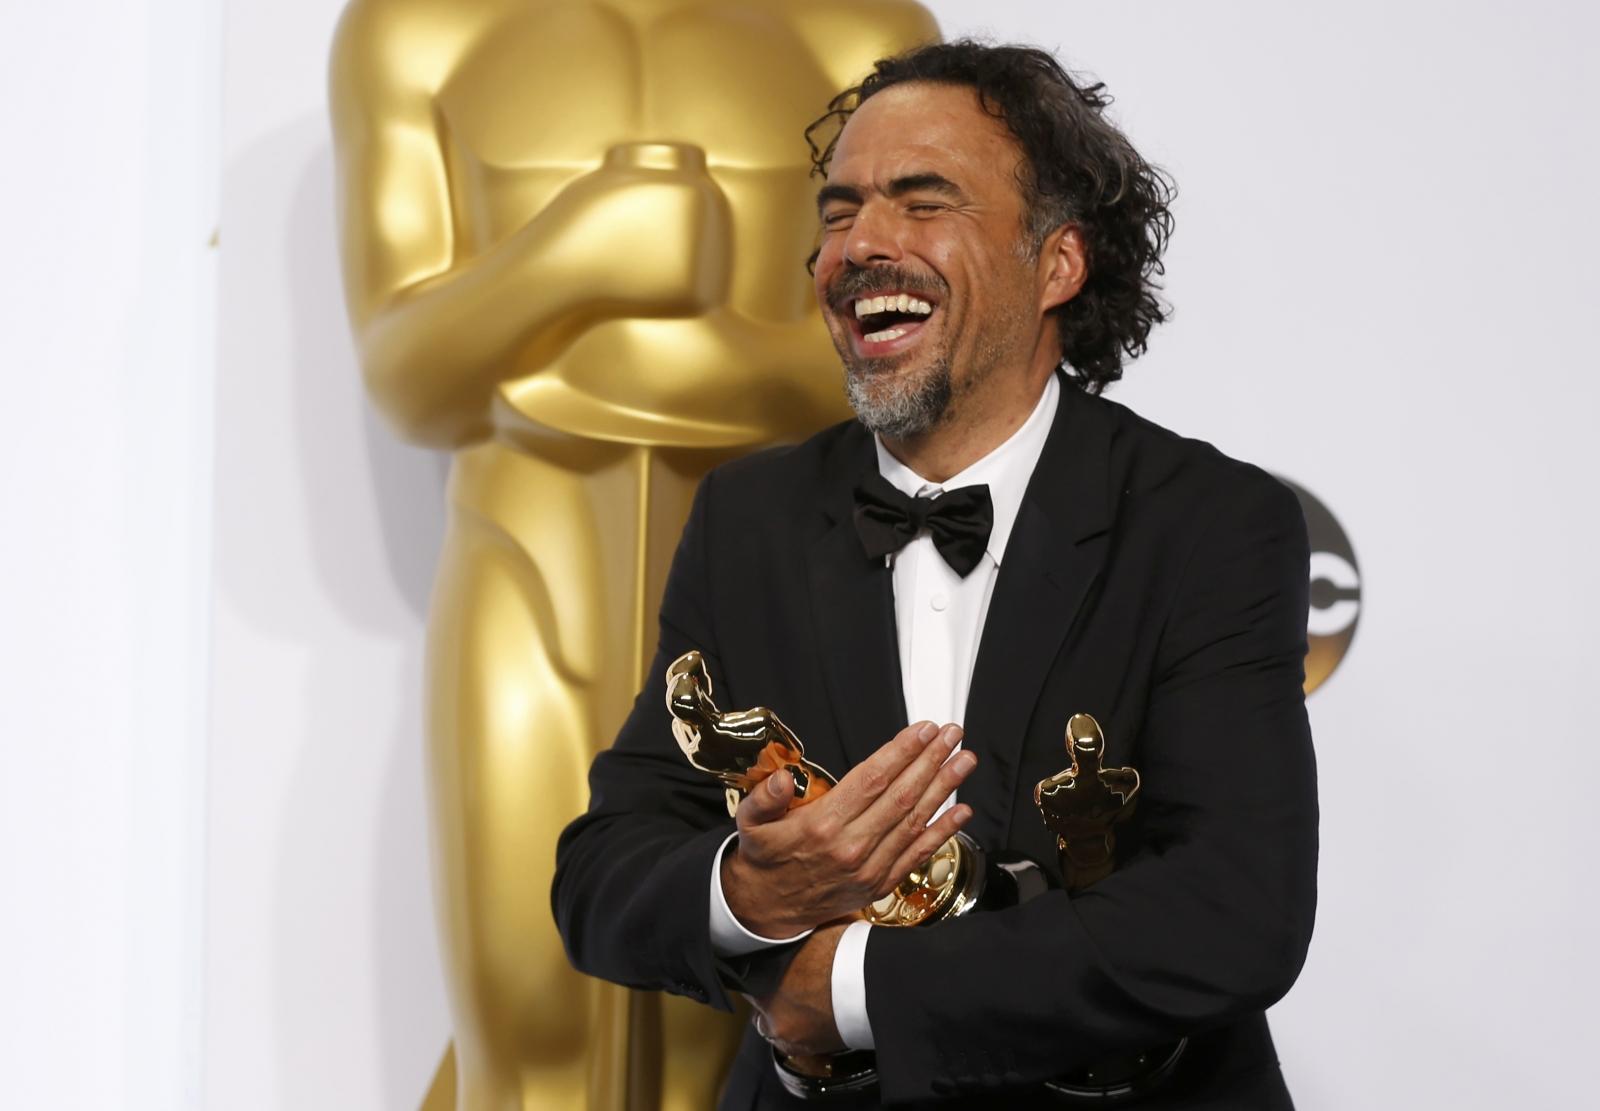 Oscars 2015: Birdman soars to top bagging four awards